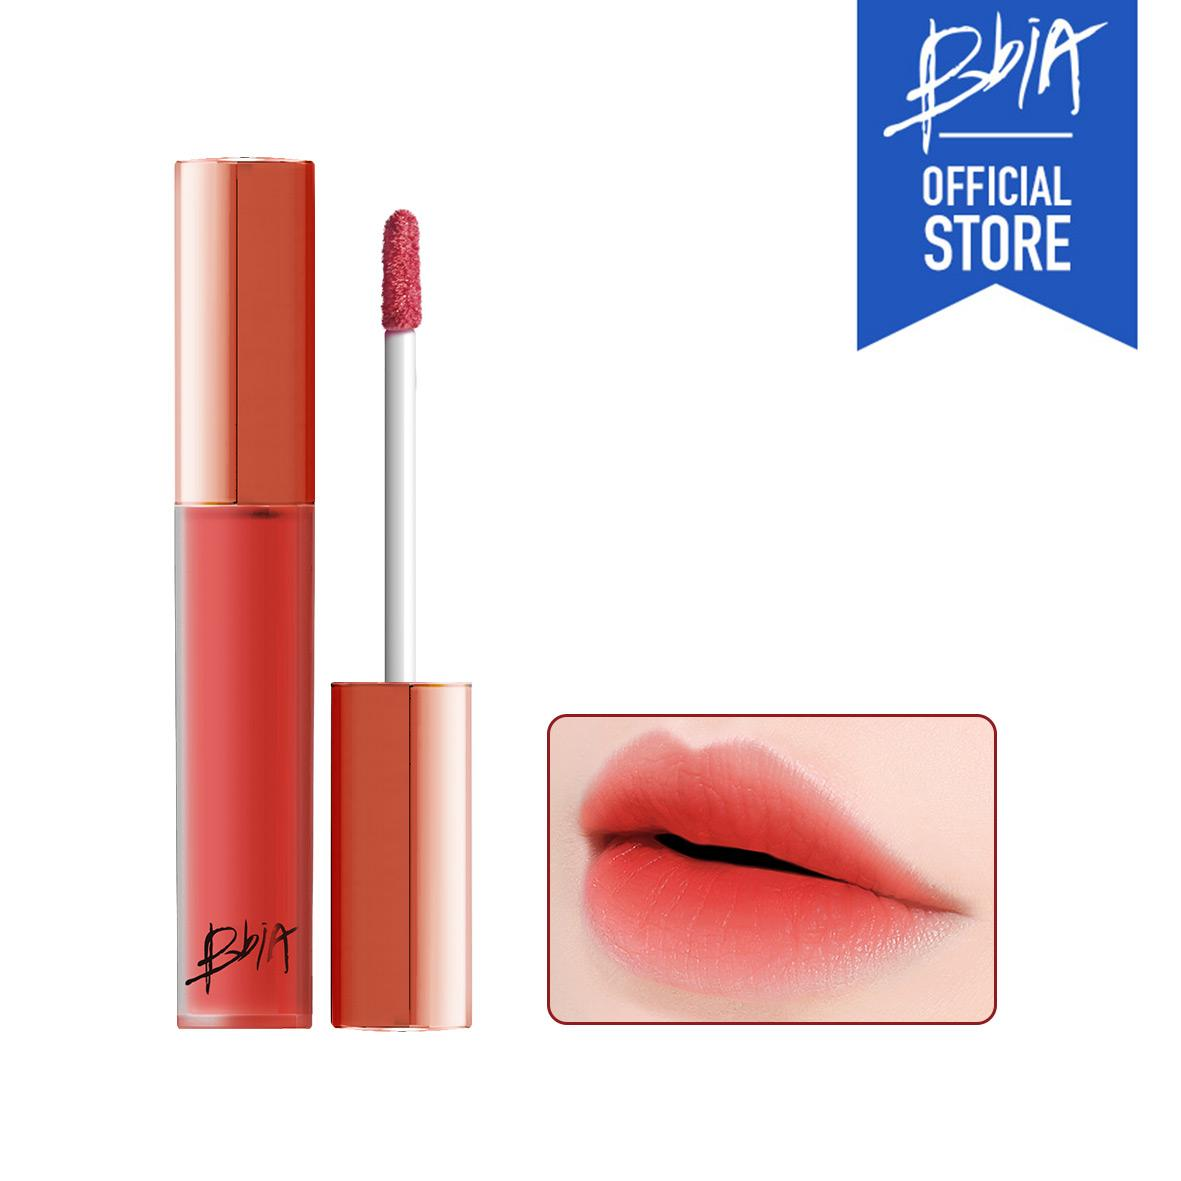 Son kem lì Bbia Last Velvet Lip Tint màu 17 - cam hồng coral